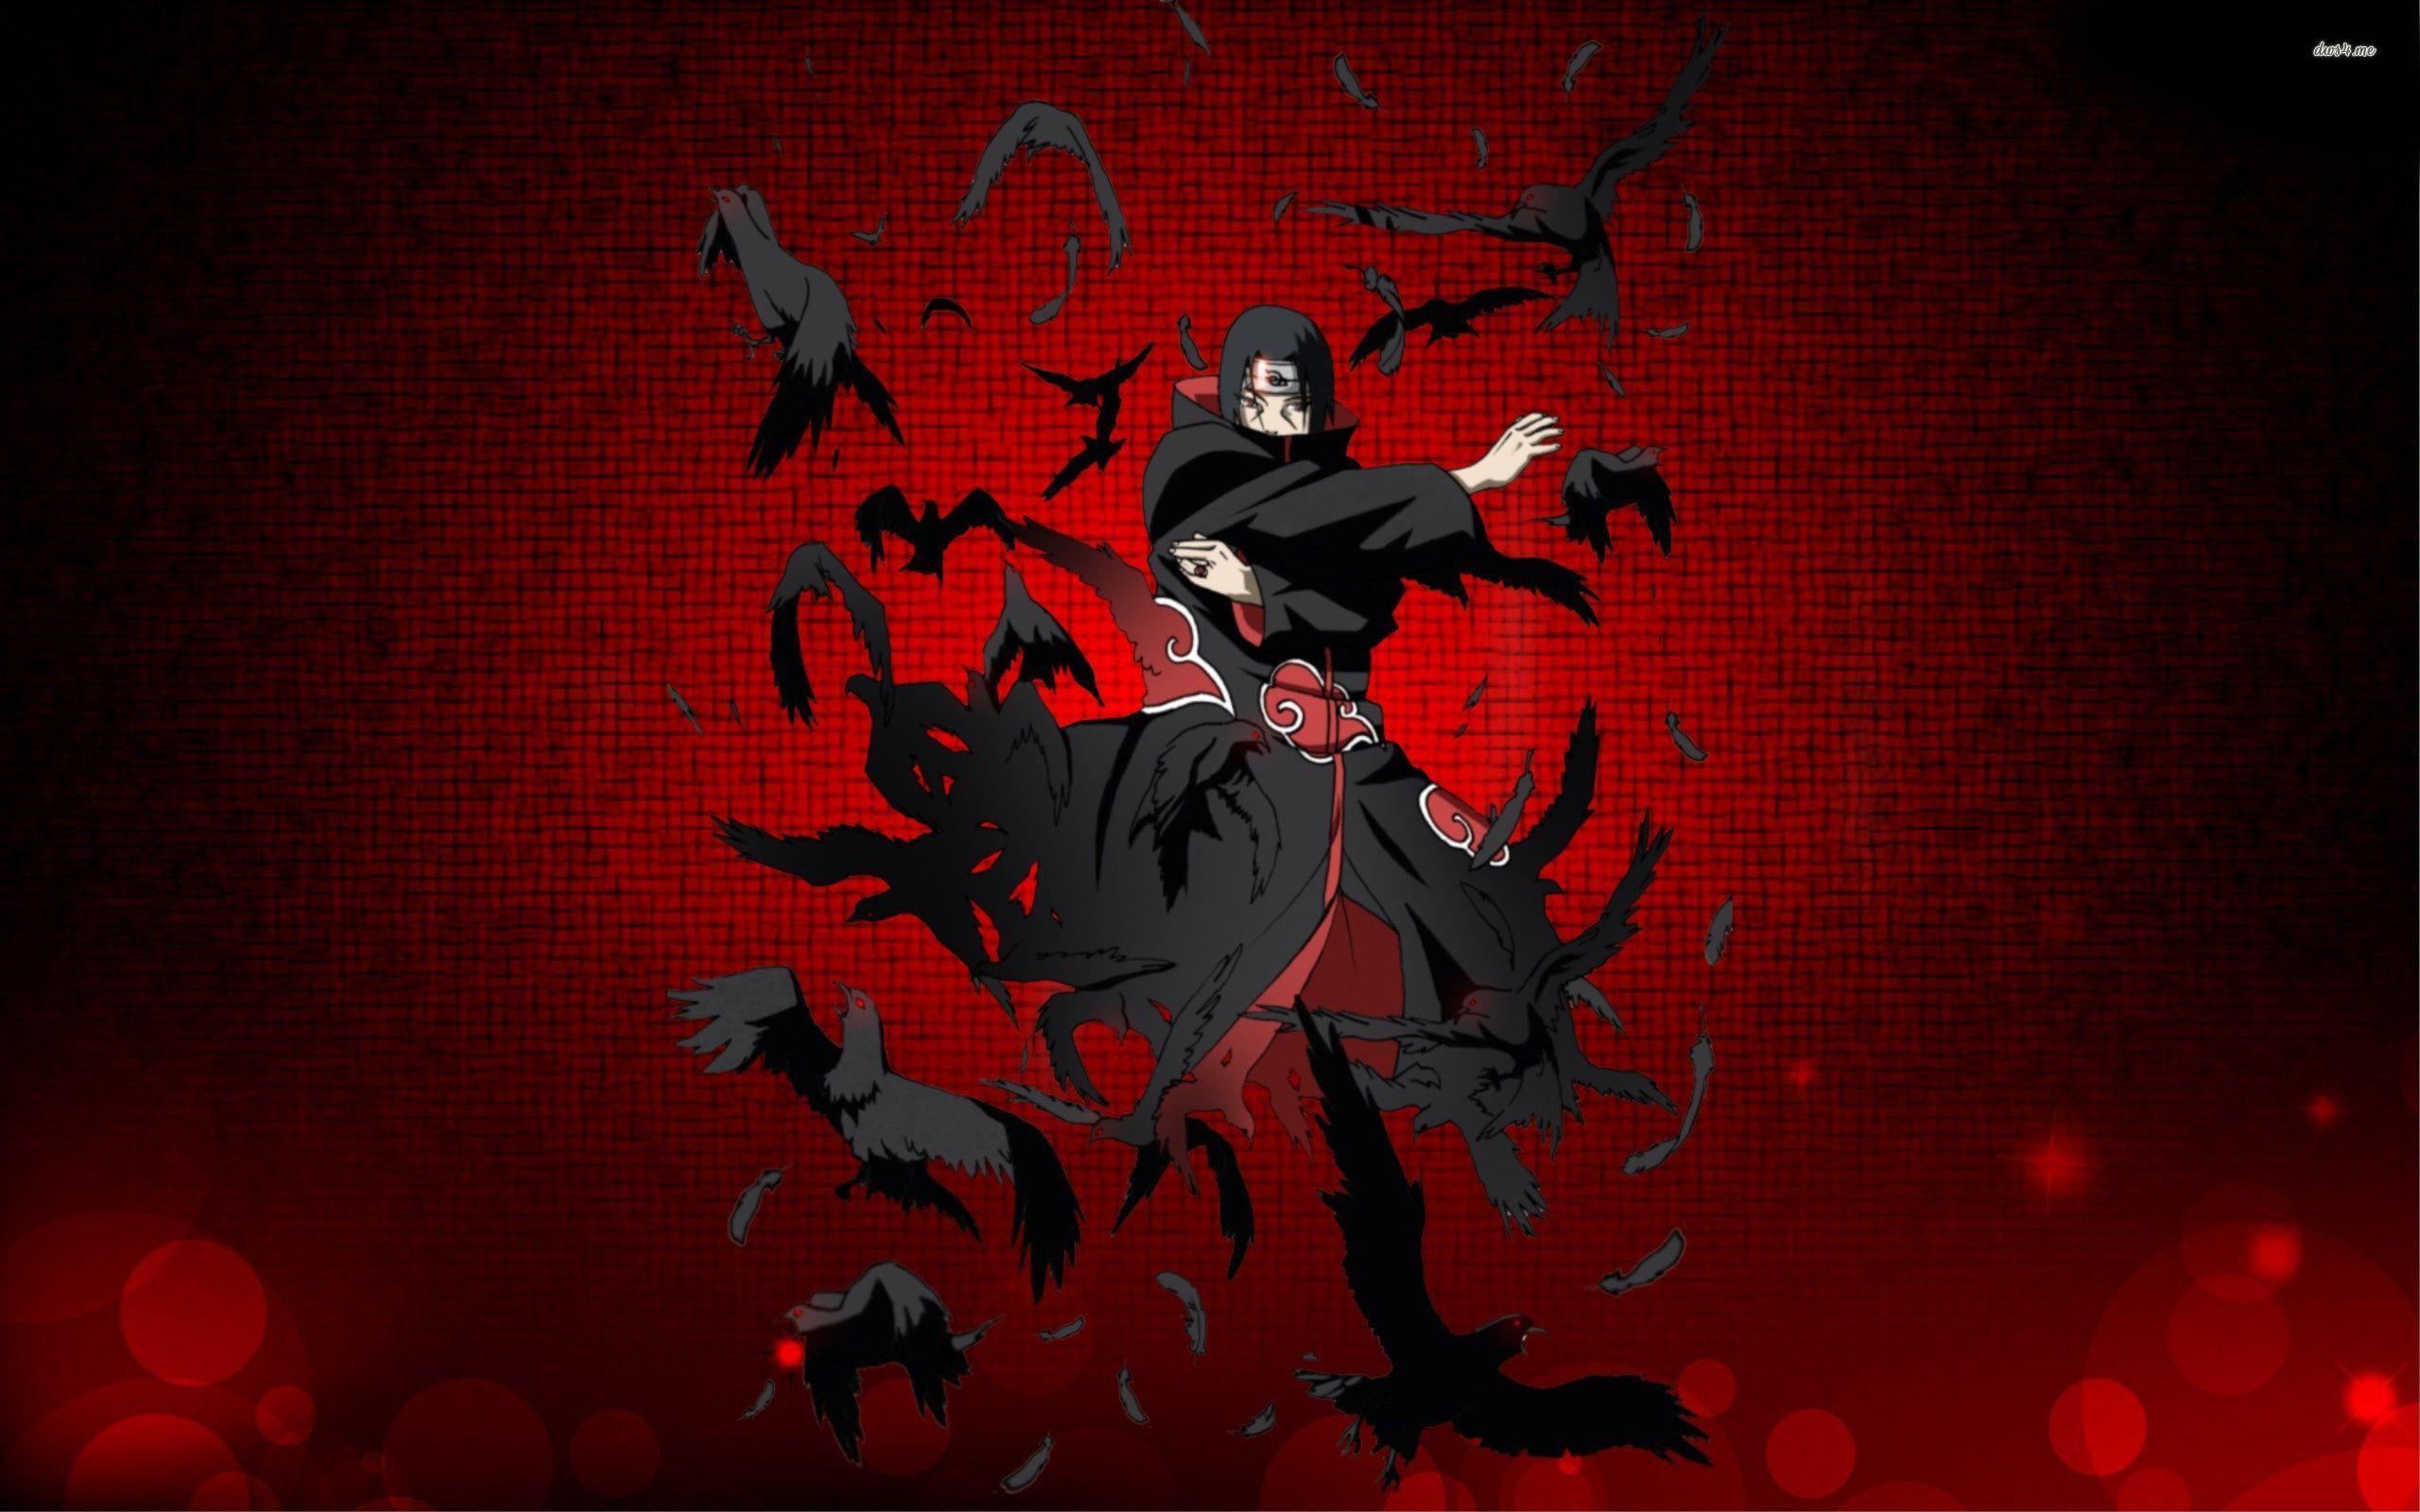 4k Naruto Wallpapers Top Free 4k Naruto Backgrounds Wallpaperaccess